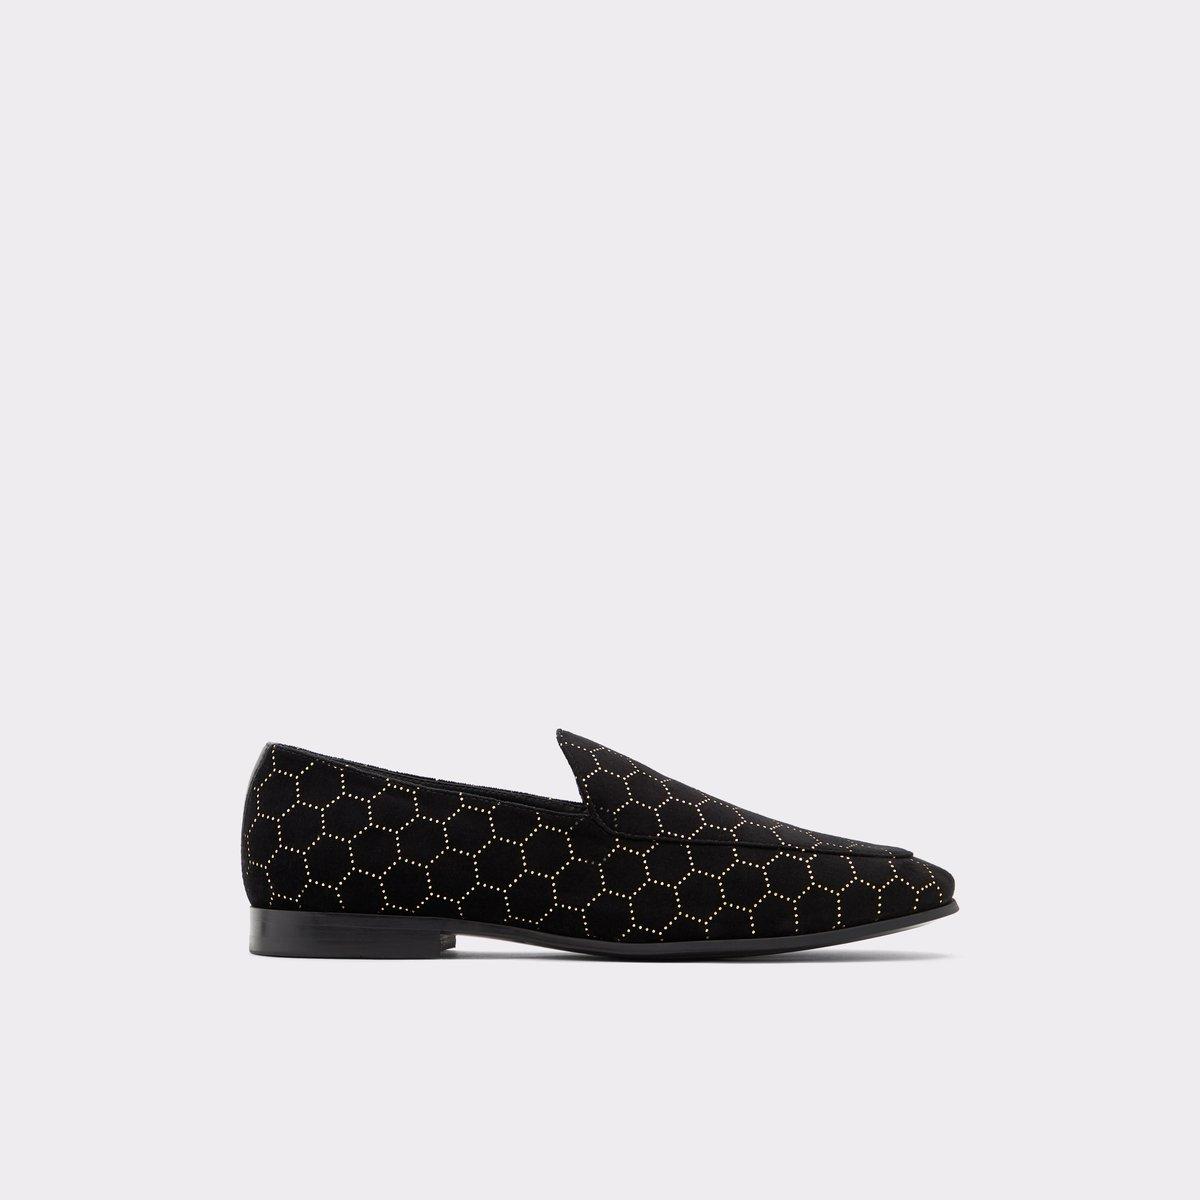 Qirarien Black Textile Men's Loafers